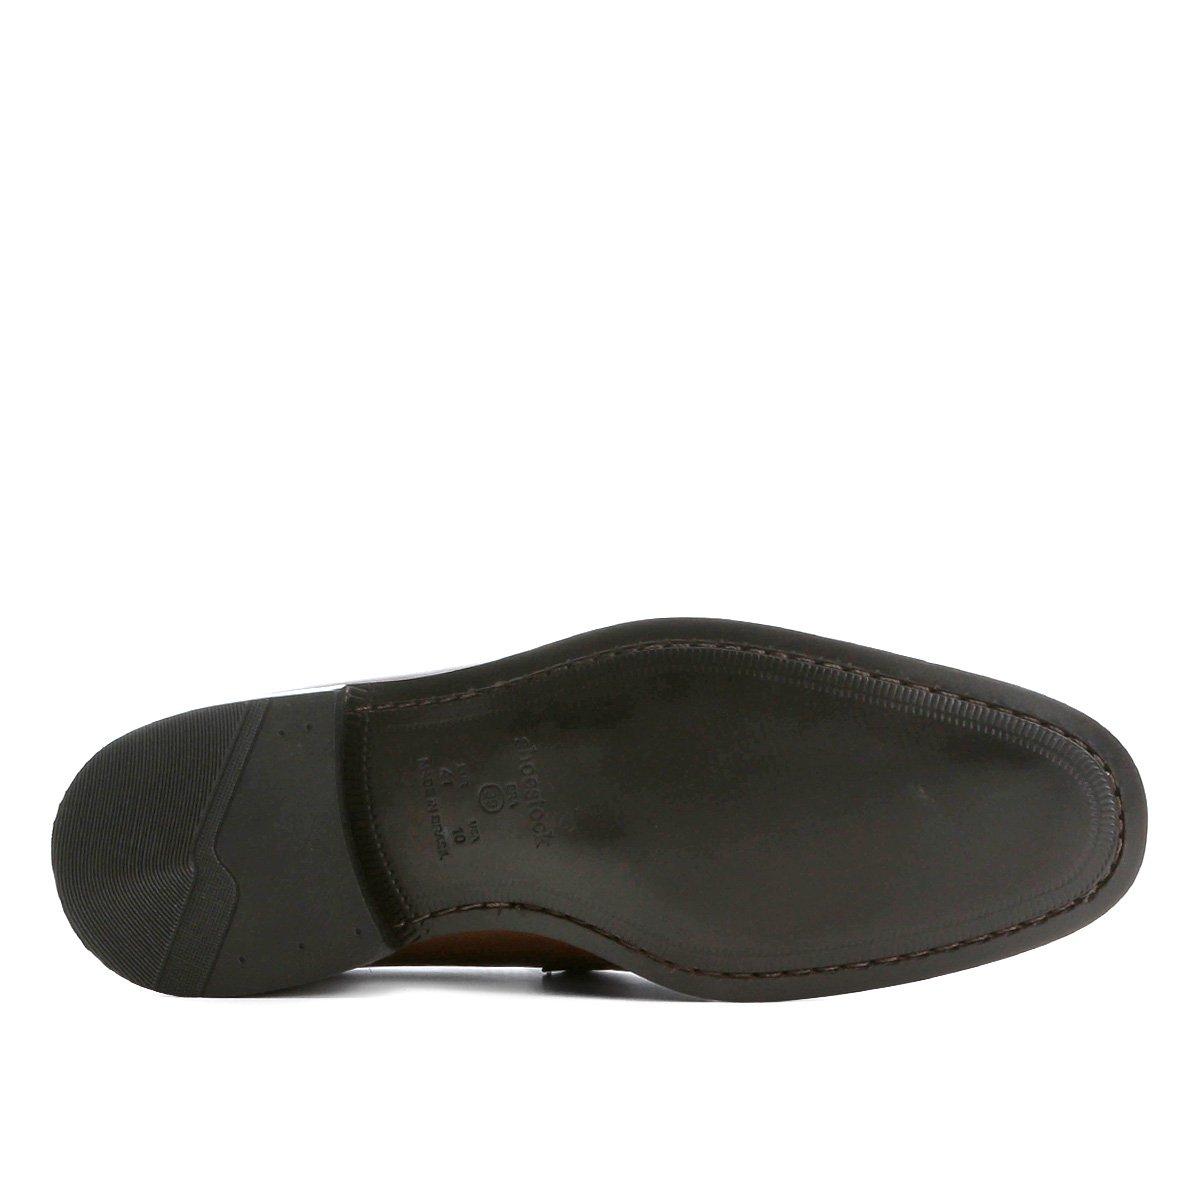 Marrom COURO Sapato Sapato Shoestock Social LOAFER Social RYqXw8